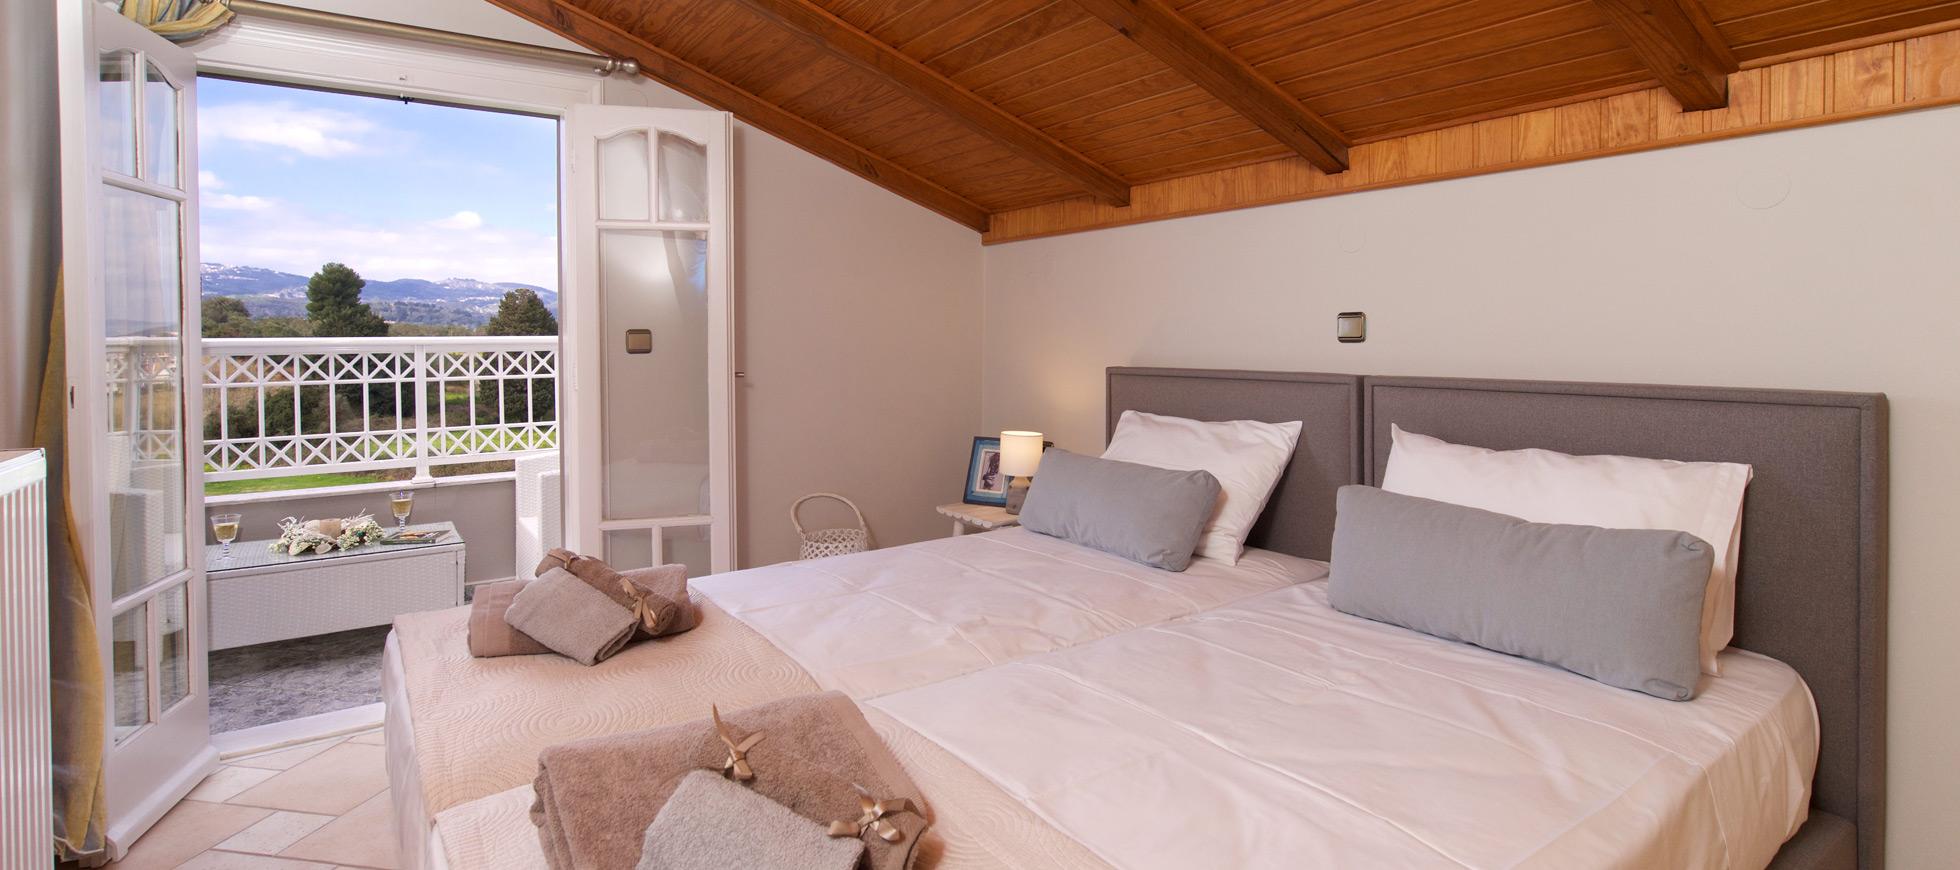 kefalonia_bright_suite_lixouri_kefalonia_apartments_05